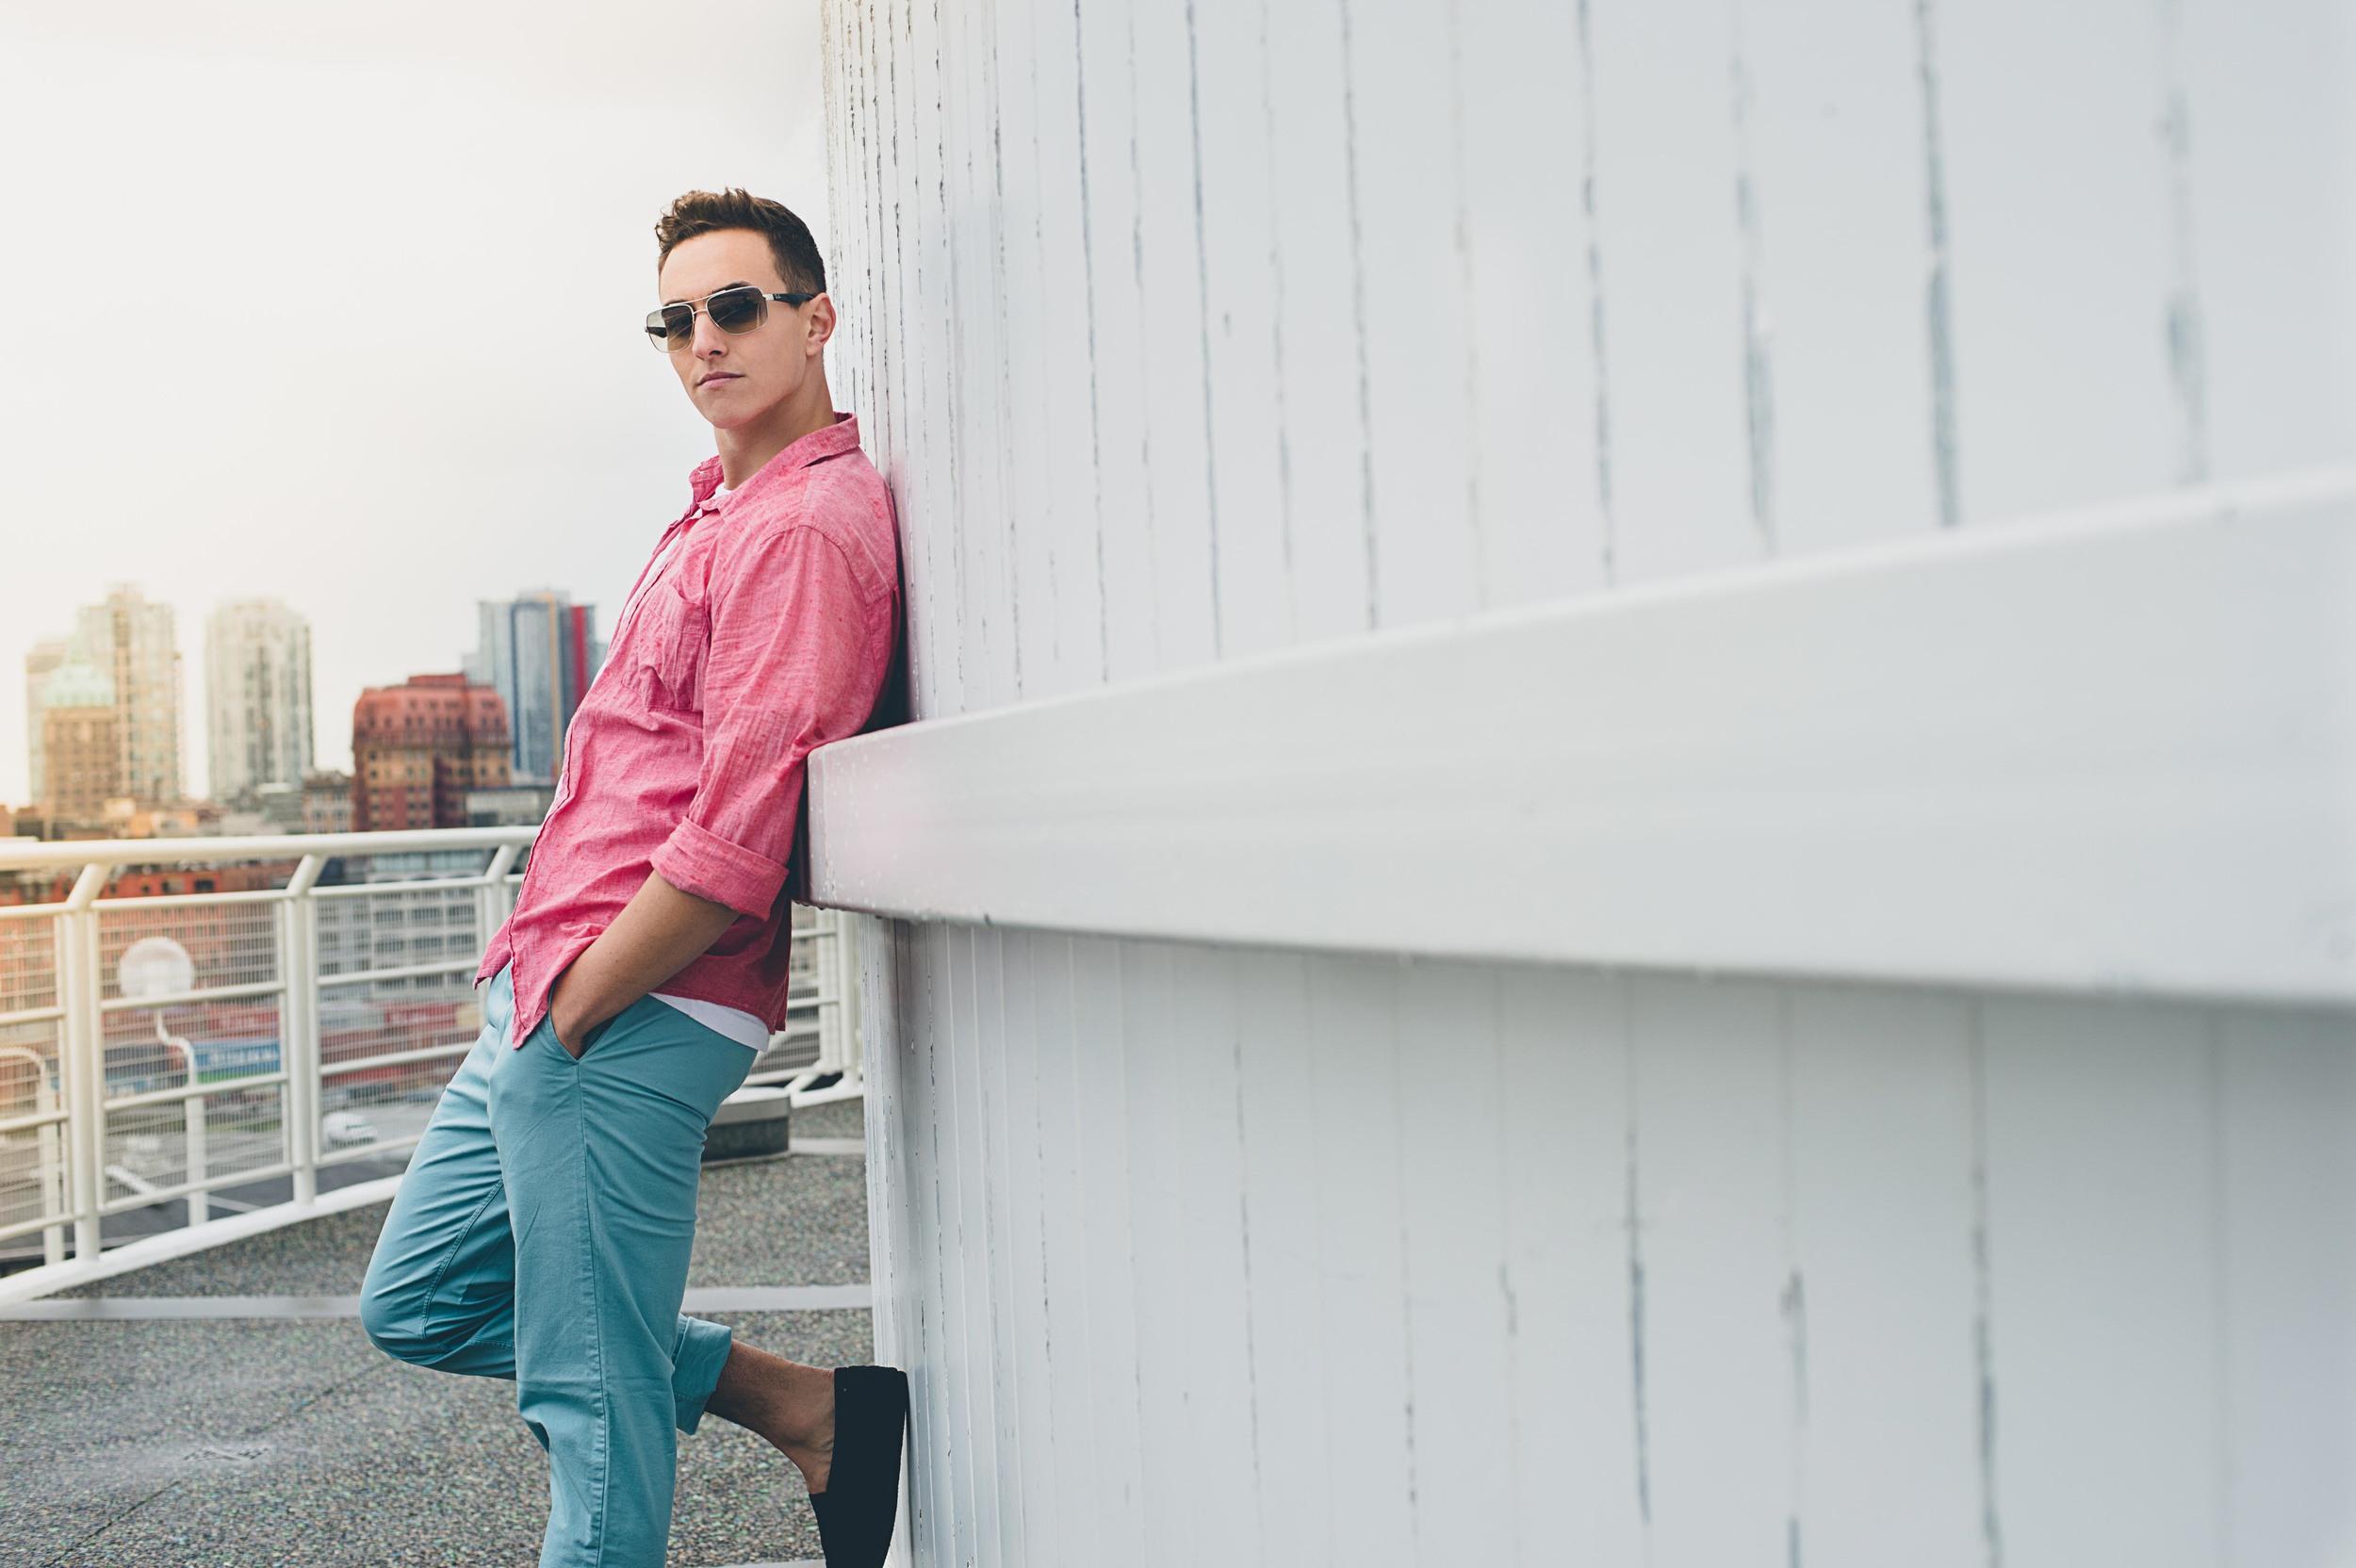 Vancouver Pan Pacific fashion photographer edward lai